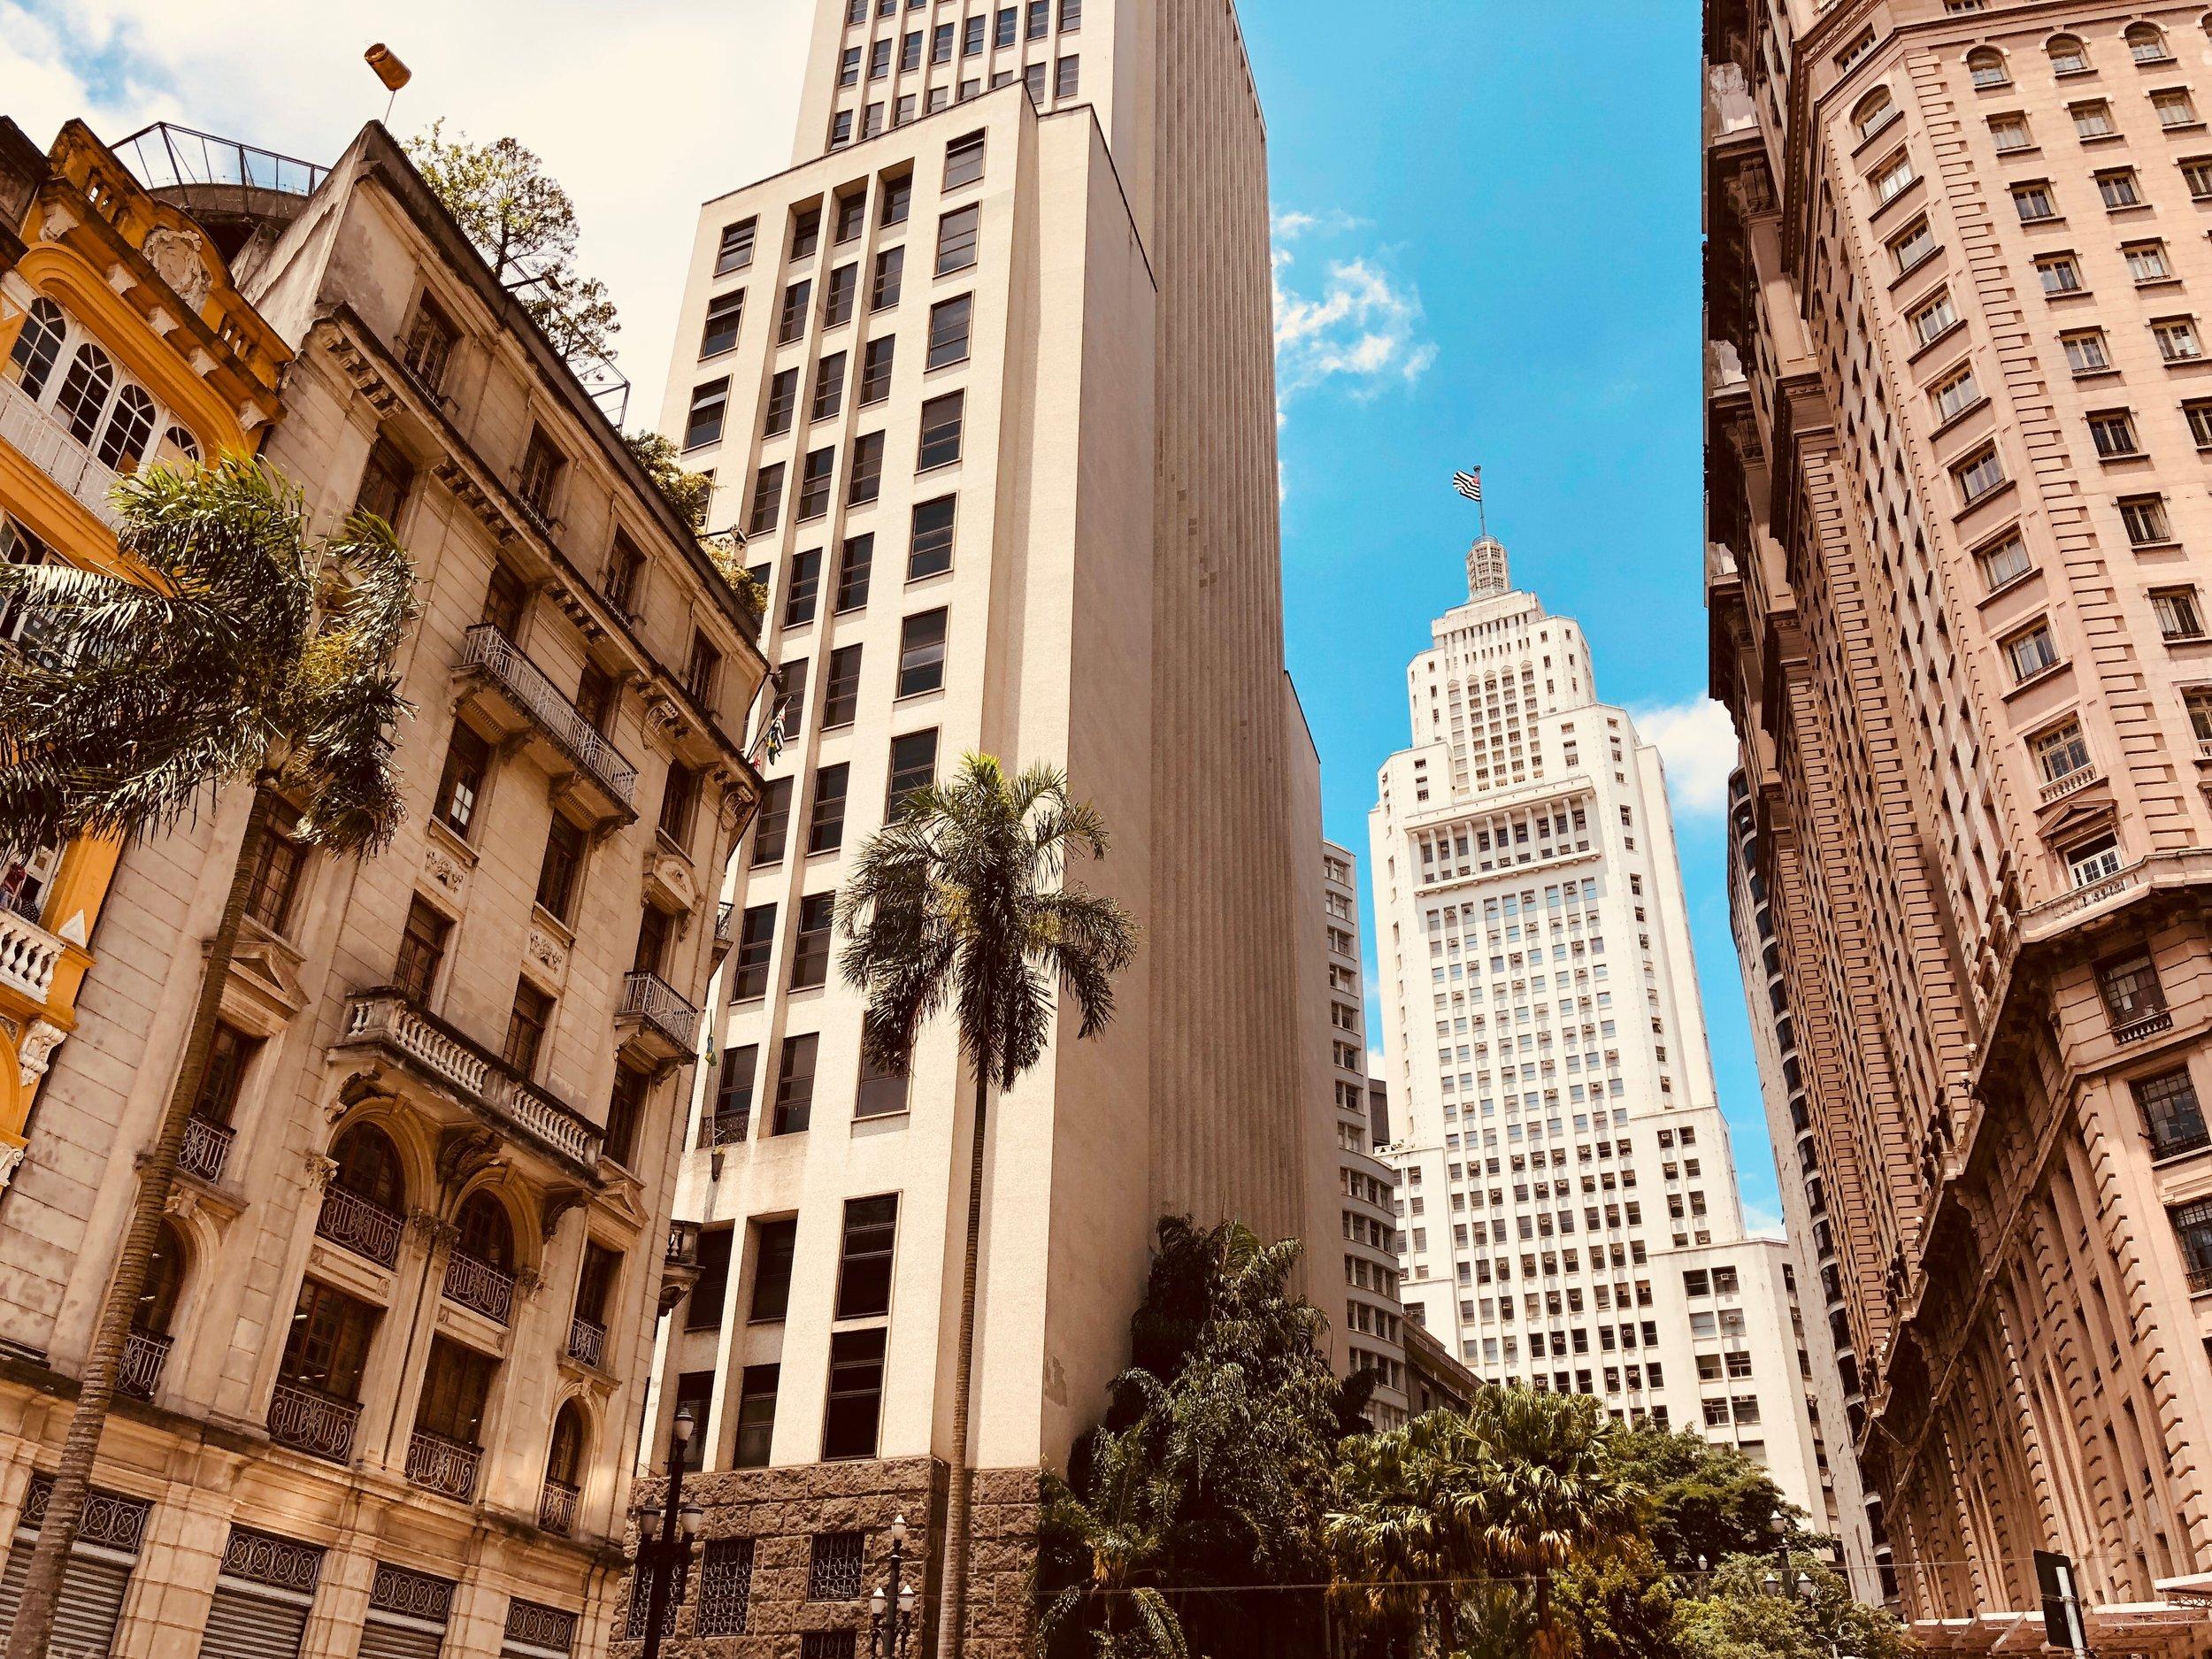 City in Sao Paulo